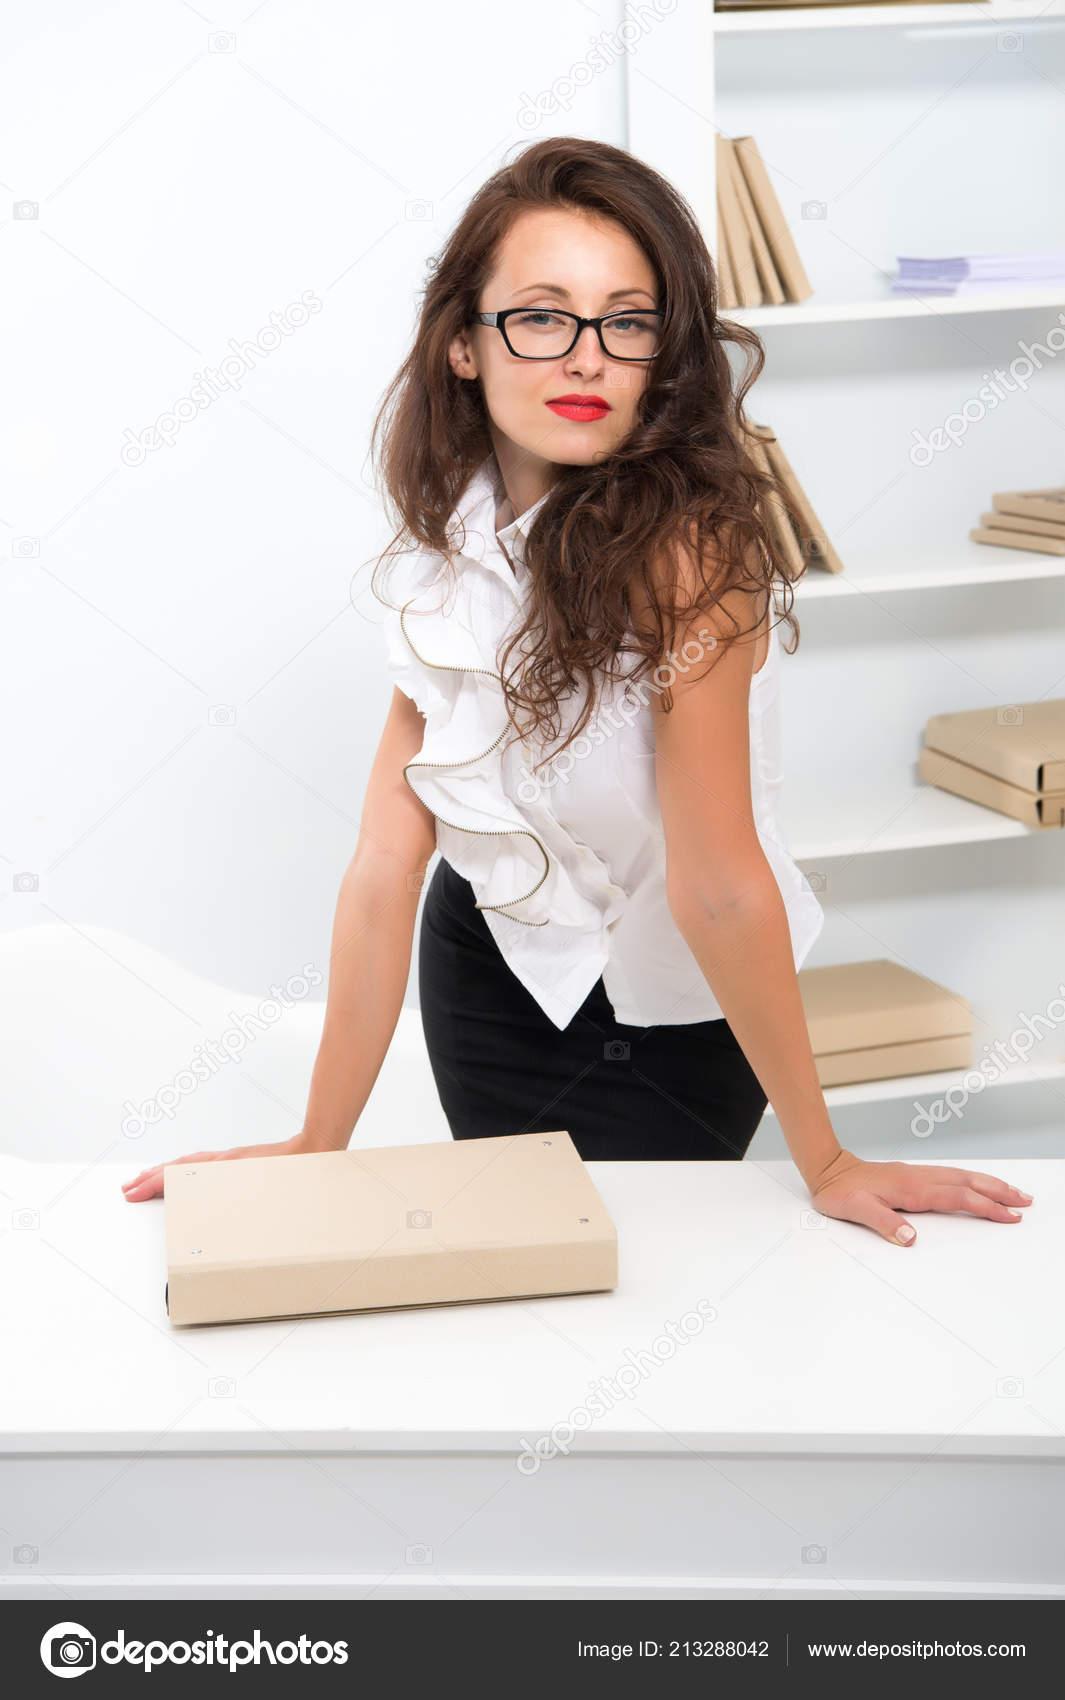 2859900ee567 Γυναίκα με μακριά μαλλιά λευκή μπλούζα. Δασκάλα με γυαλιά φαίνεται  ελκυστικό. Σαγηνευτικό γραφείο διαχειριστή ποζάρει με σιγουριά. Θέλει  Έλεγχος εγγράφου.